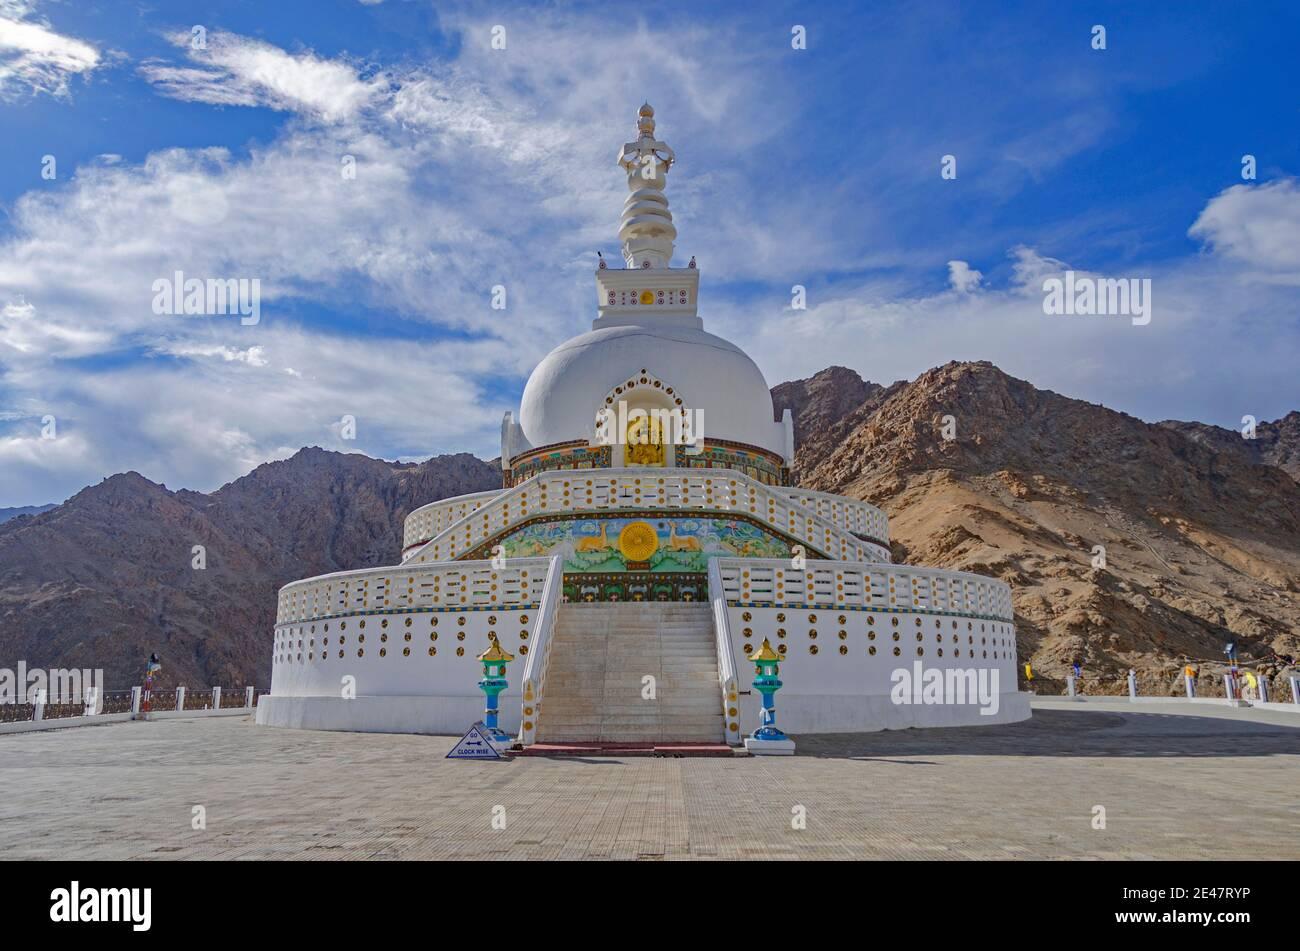 Shanti Stupa  a Buddhist white-domed stupa on a hilltop in Chanspa, Leh district,  Ladakh, India Stock Photo